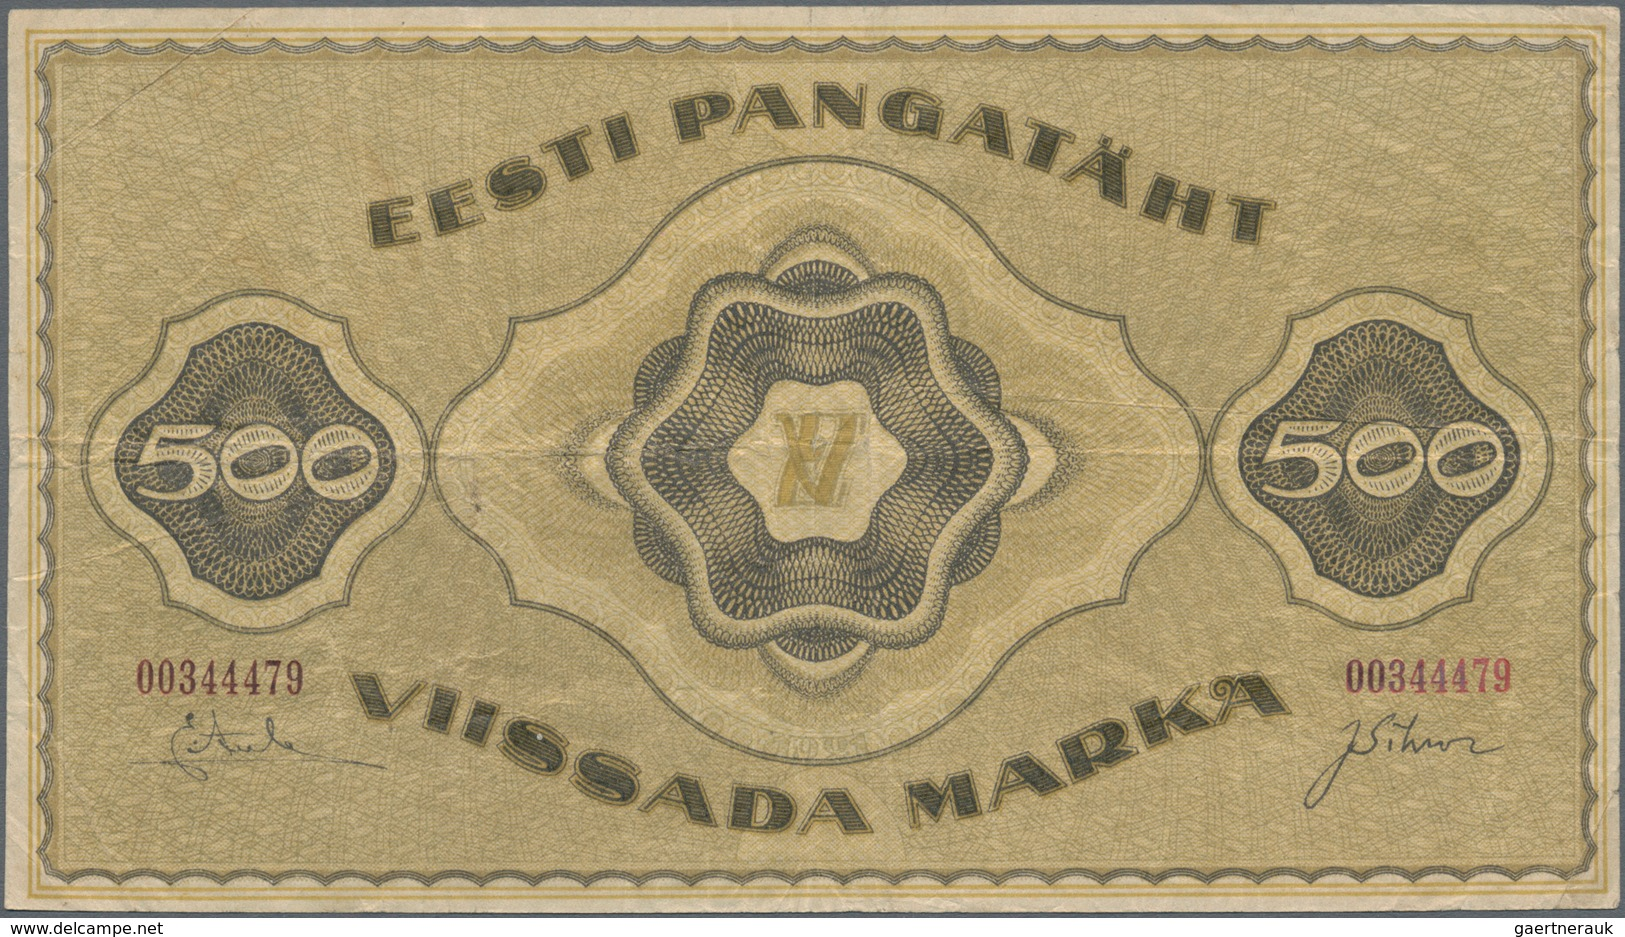 Estonia / Estland: Eesti Pangatäht 500 Marka 1921, P.57a, Great Condition Without Larger Damages Wit - Estonia